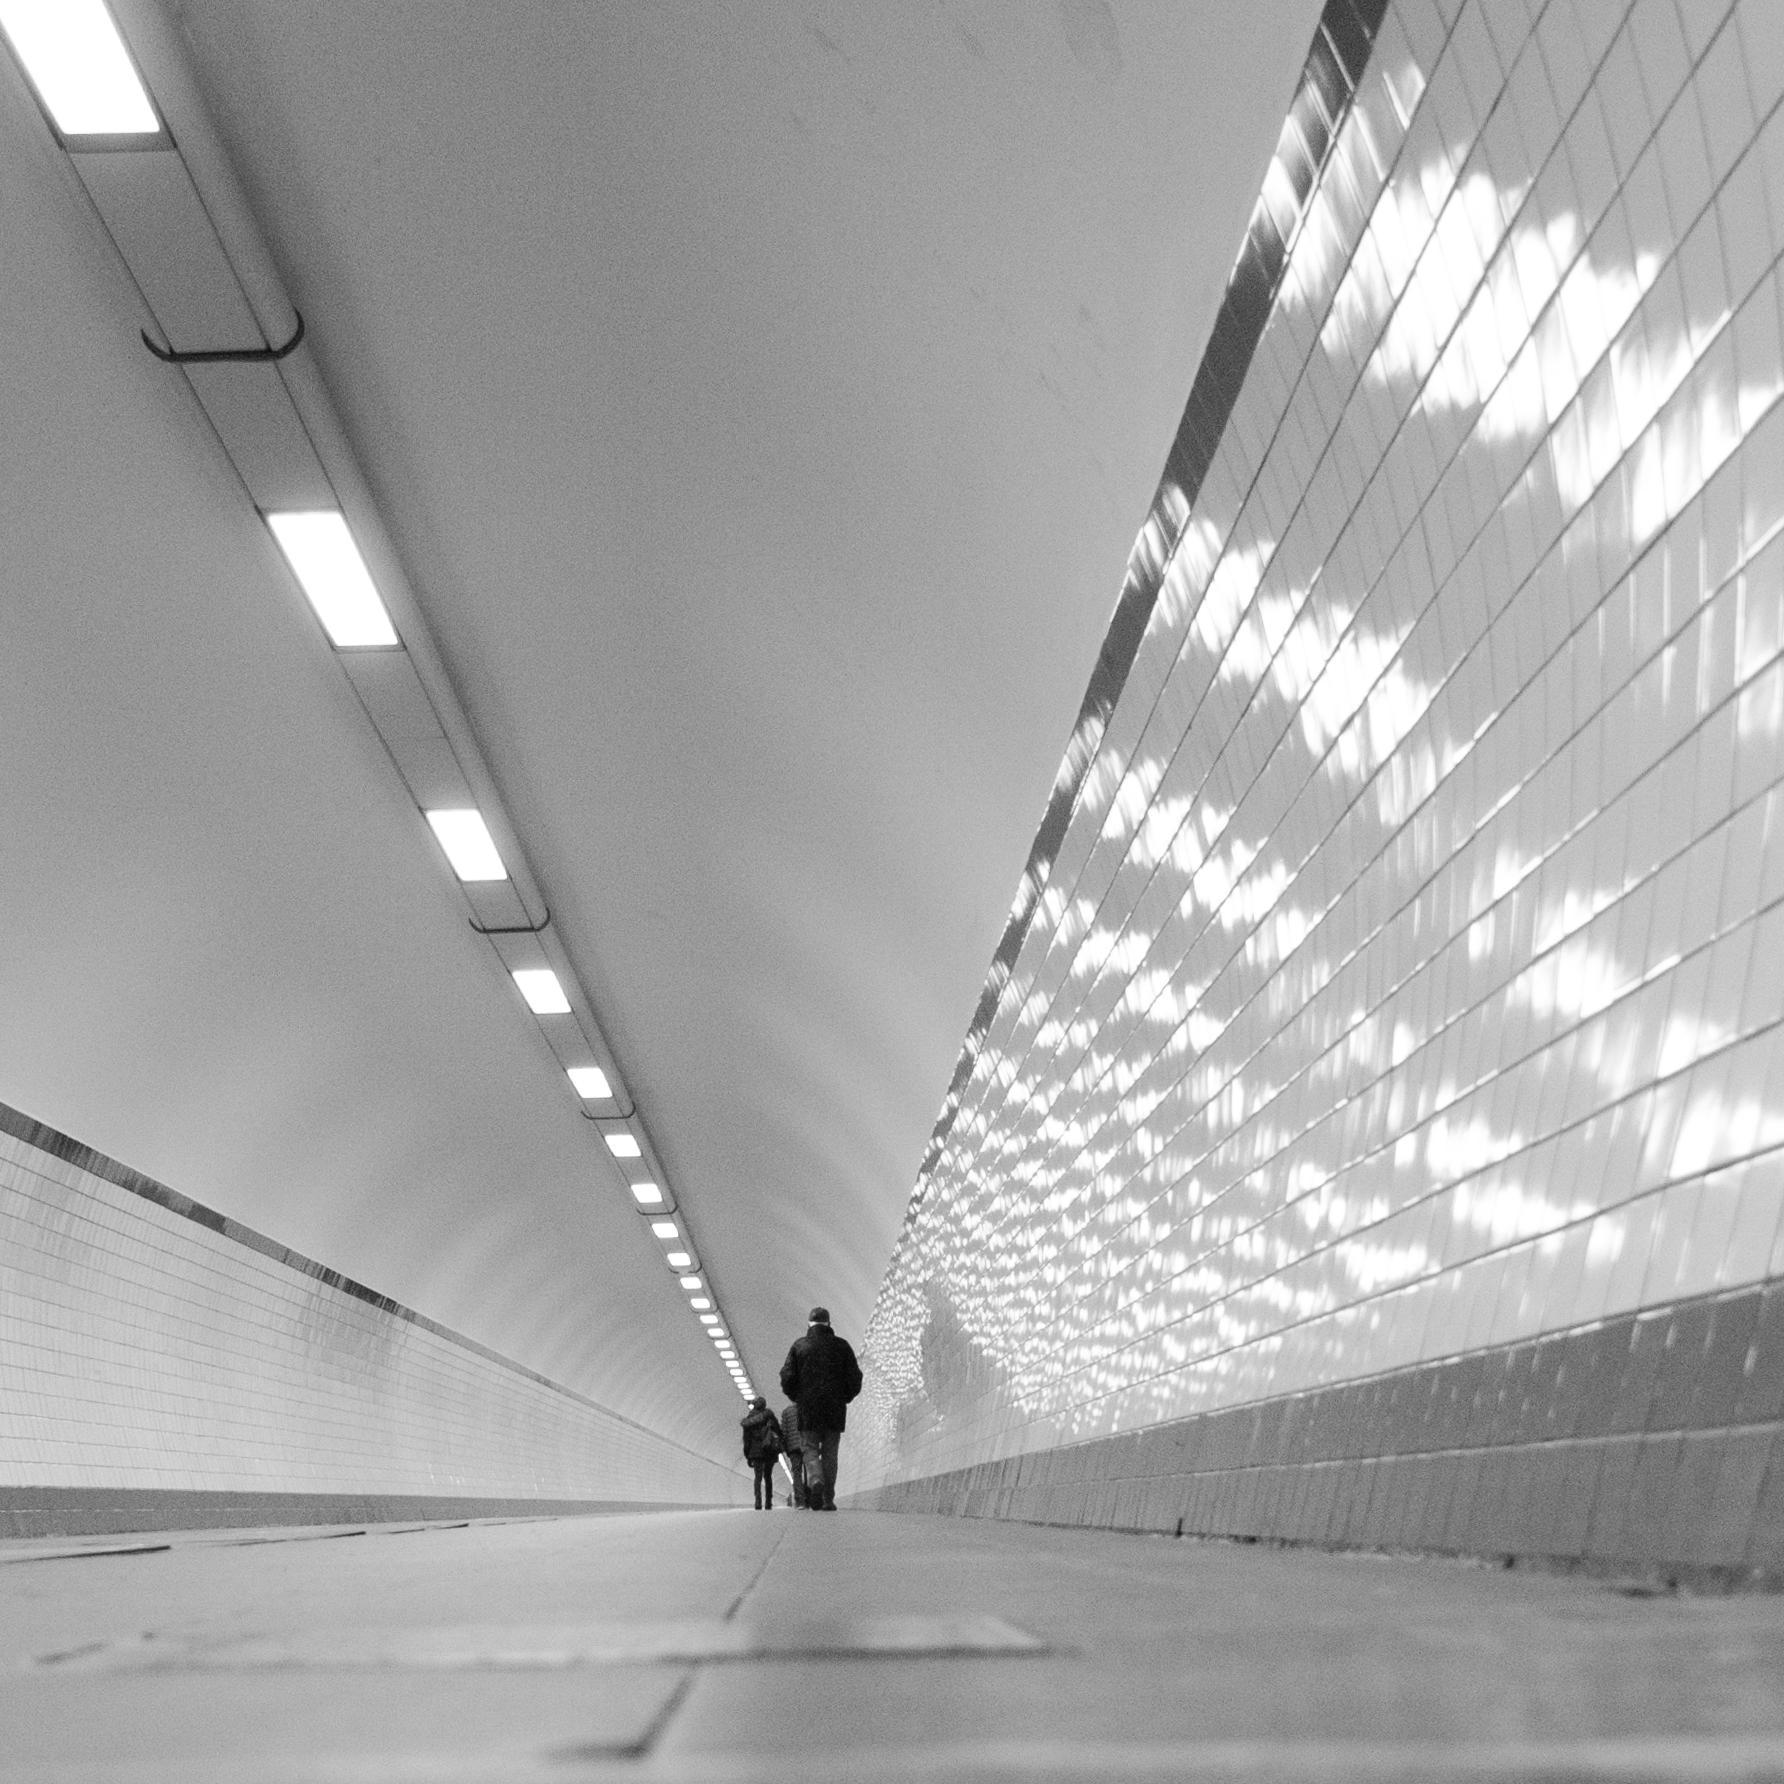 tunnel atwerpen